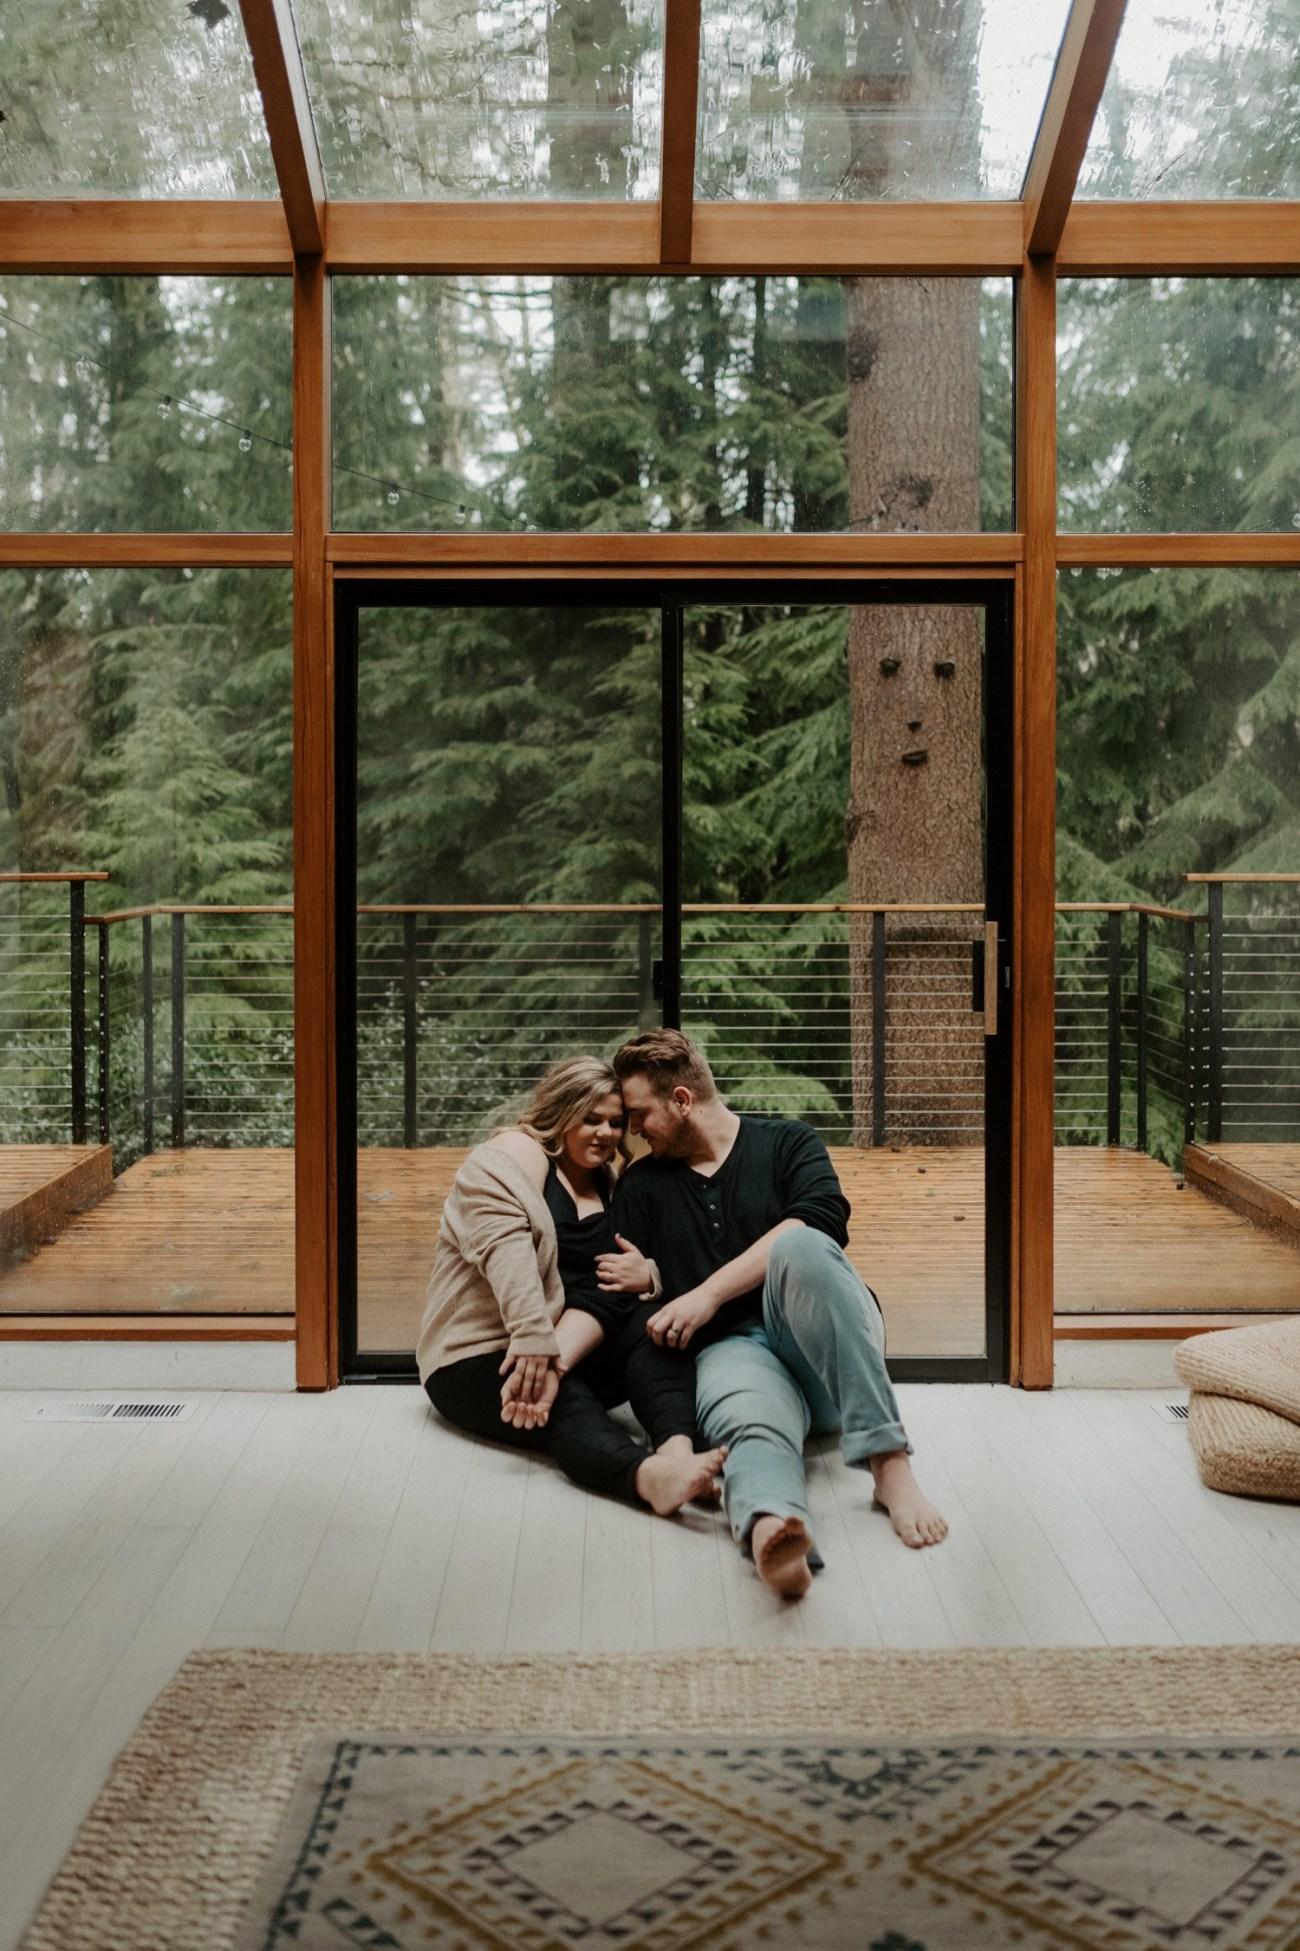 The Woodlands House Sandy Oregon In Home Session Portland Wedding Photographer Portland Elopement Photographer Anais Possamai Photography 023